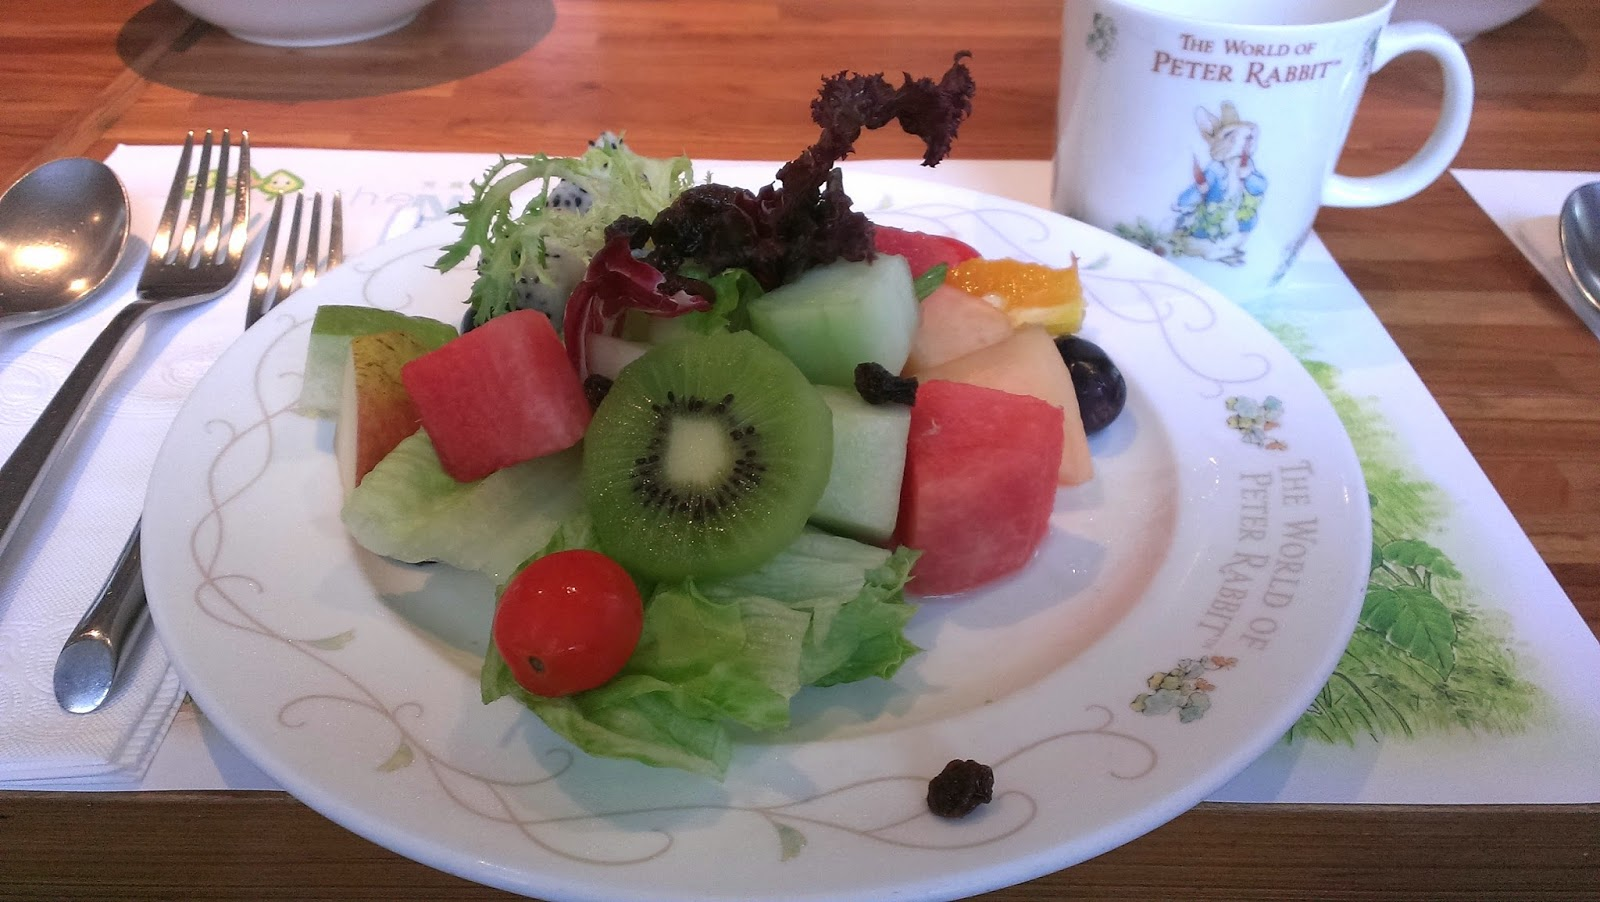 2014 09 08%2B12.38.45 - [食記] 芳庭彼得 - 義式創意無菜單料理,適合溫馨的小聚